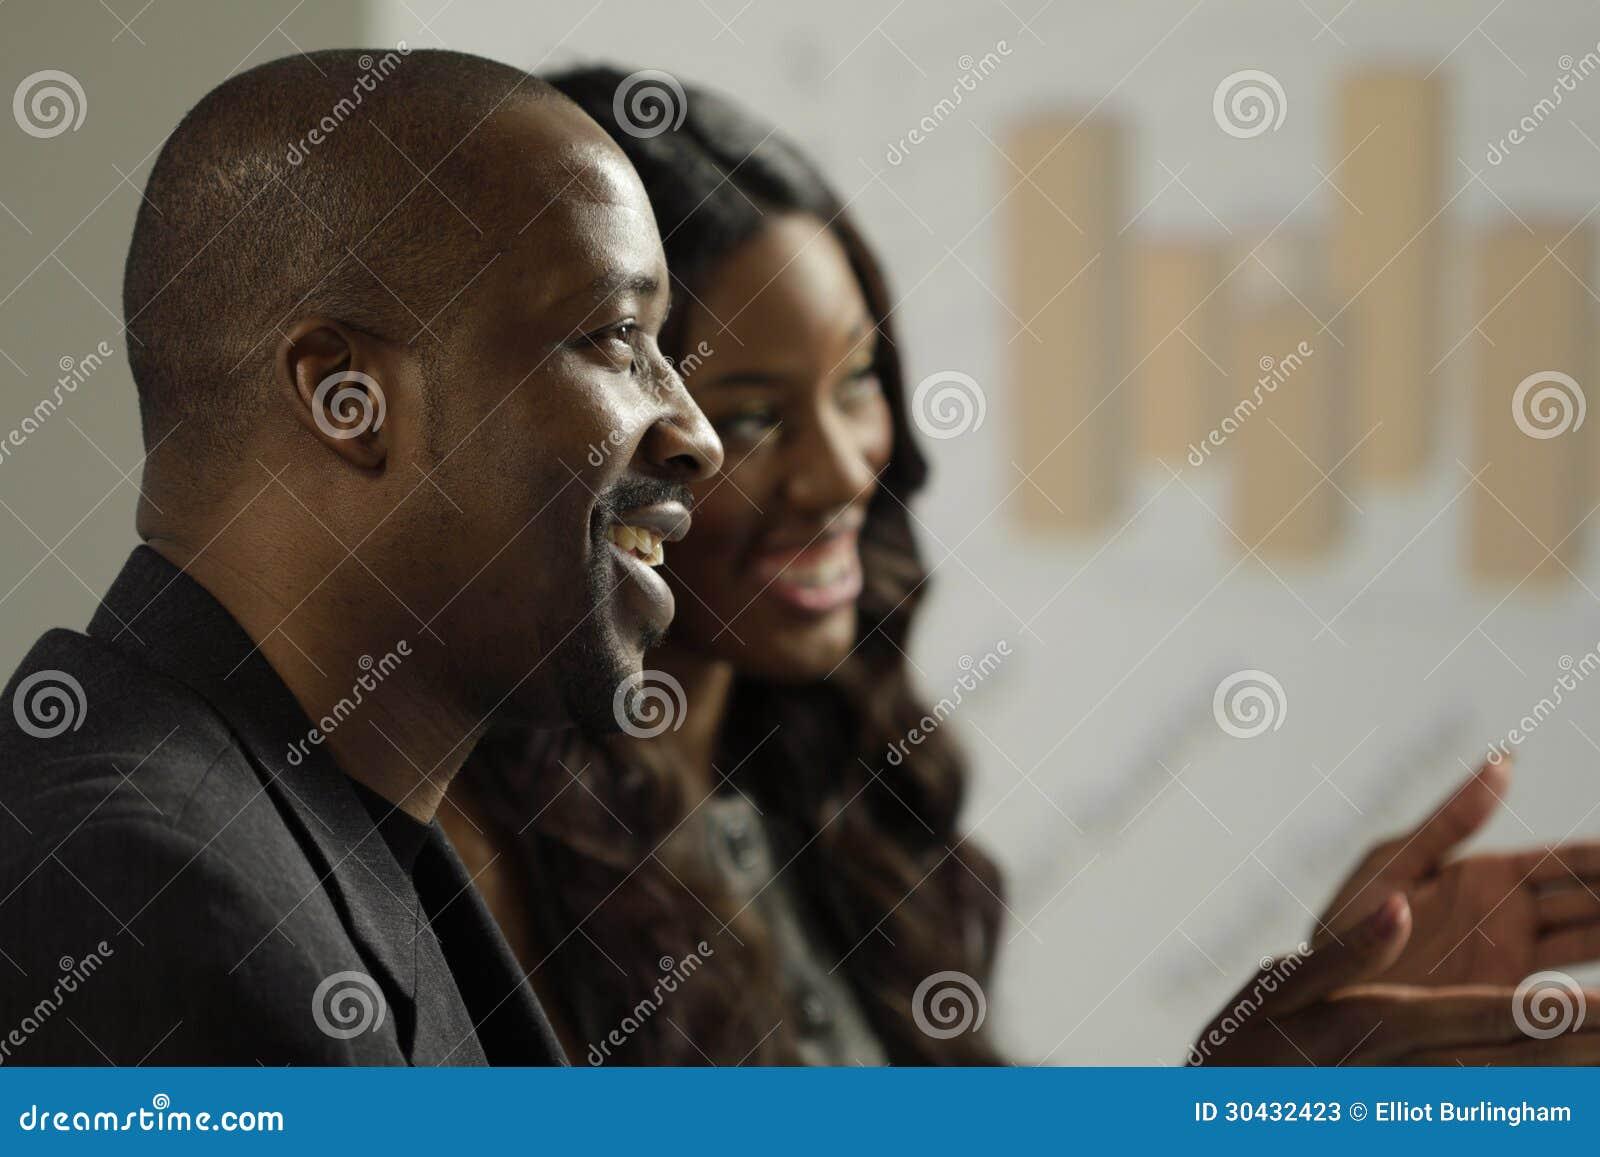 Men seeking african women